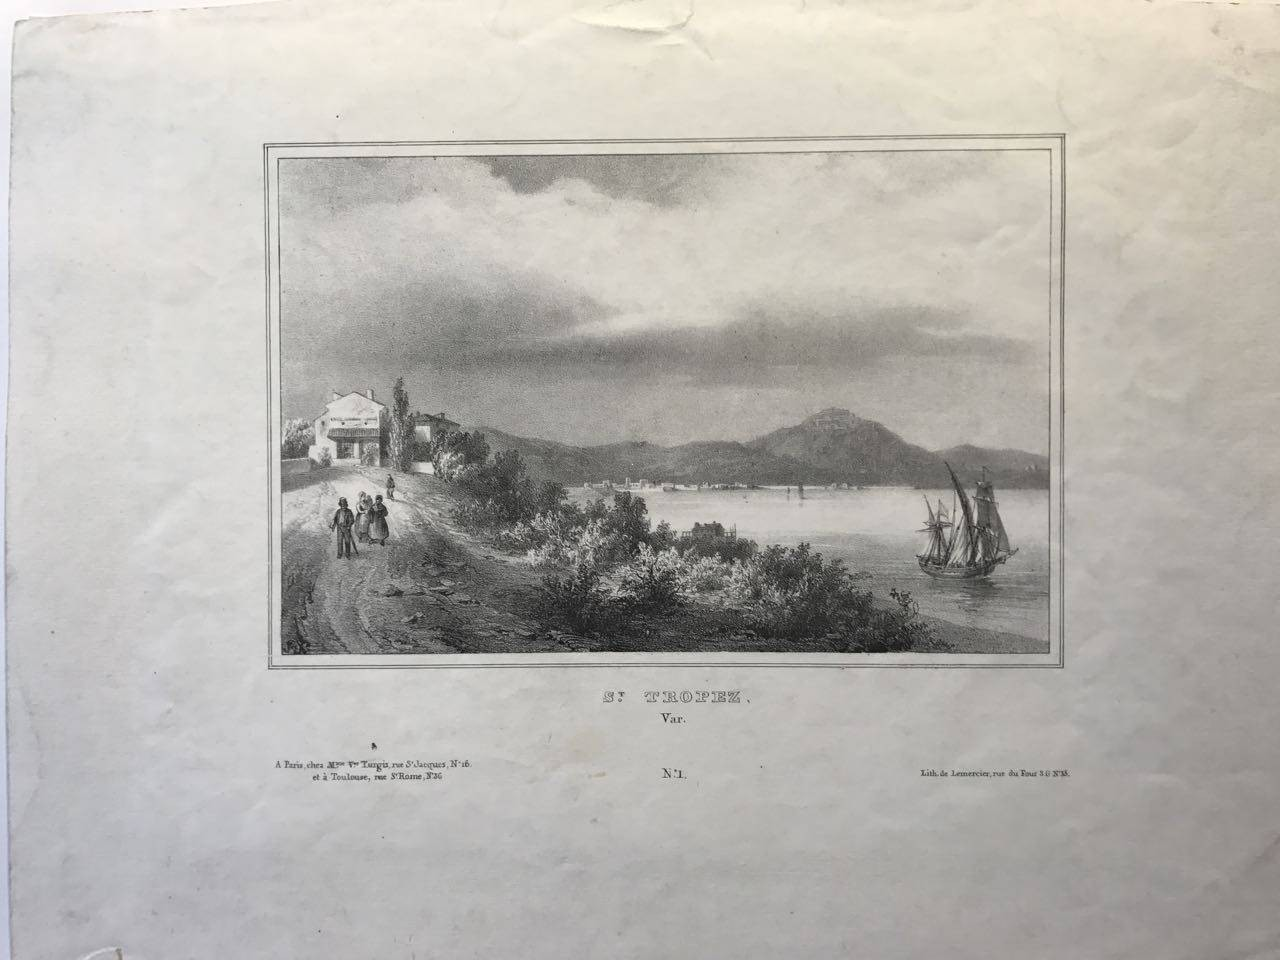 Saint Tropez, Var,1840